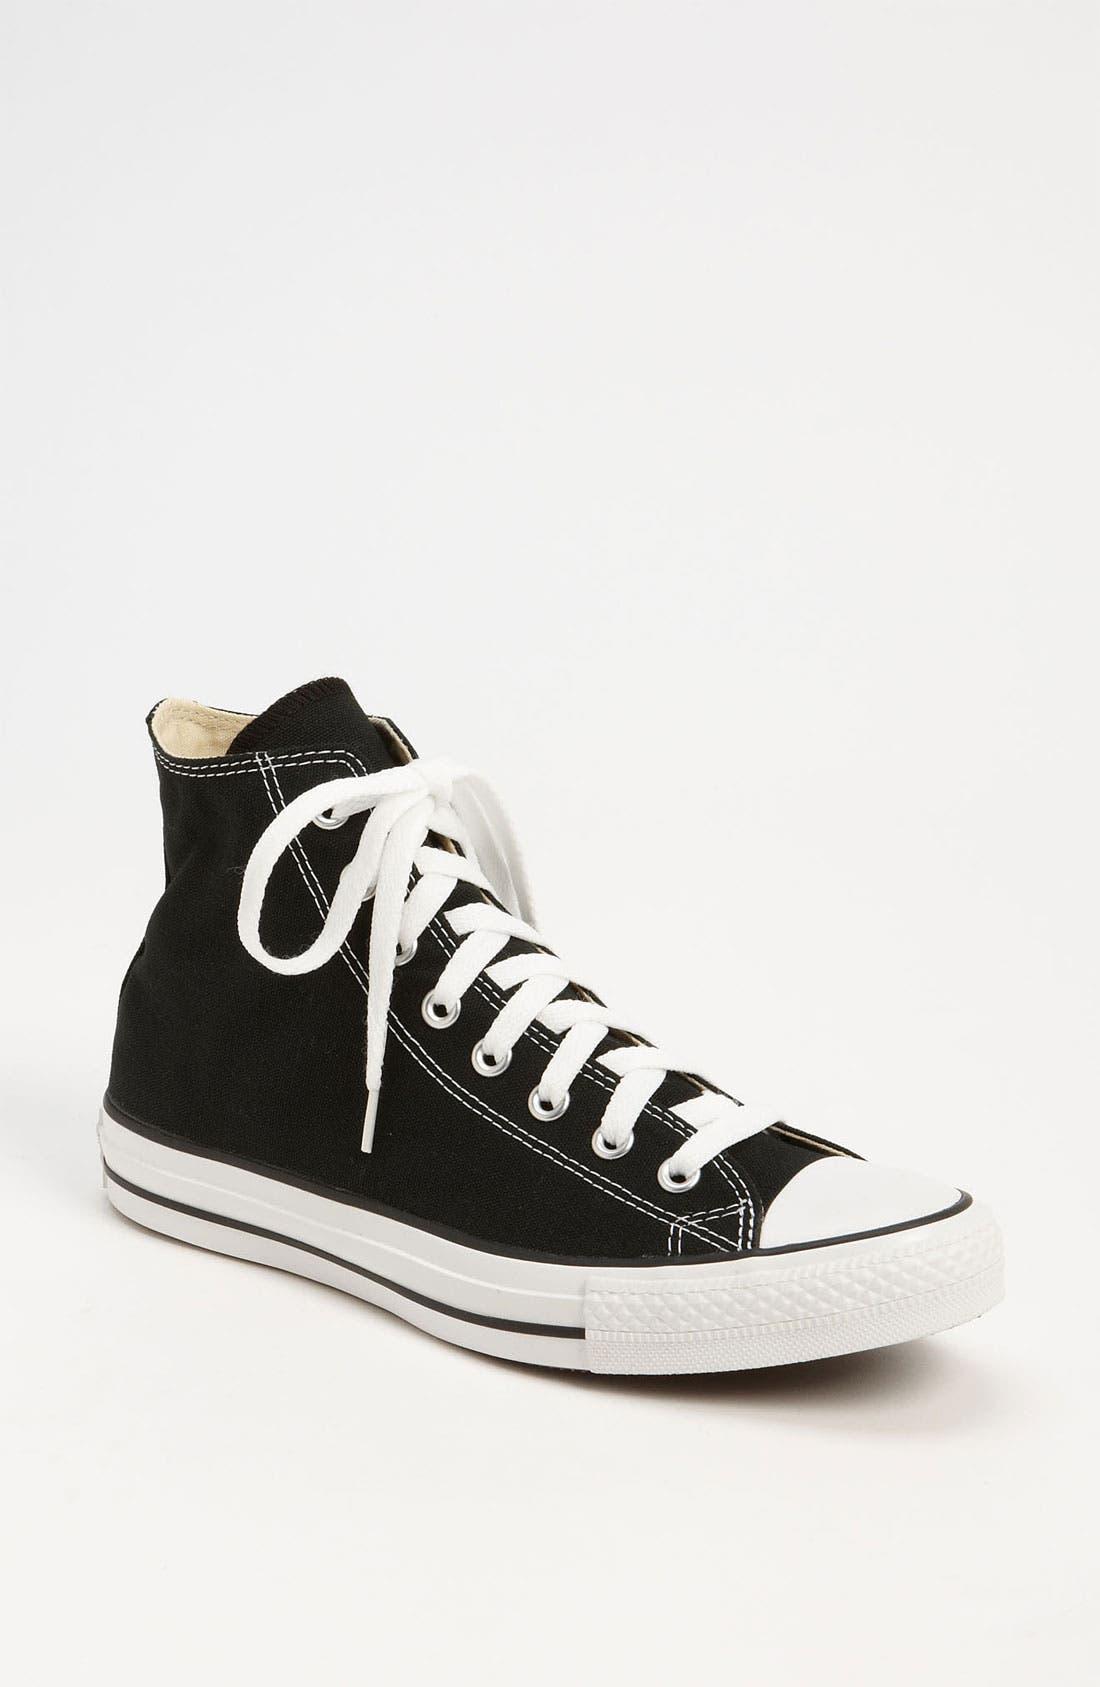 Alternate Image 1 Selected - Converse Chuck Taylor® High Top Sneaker (Women)